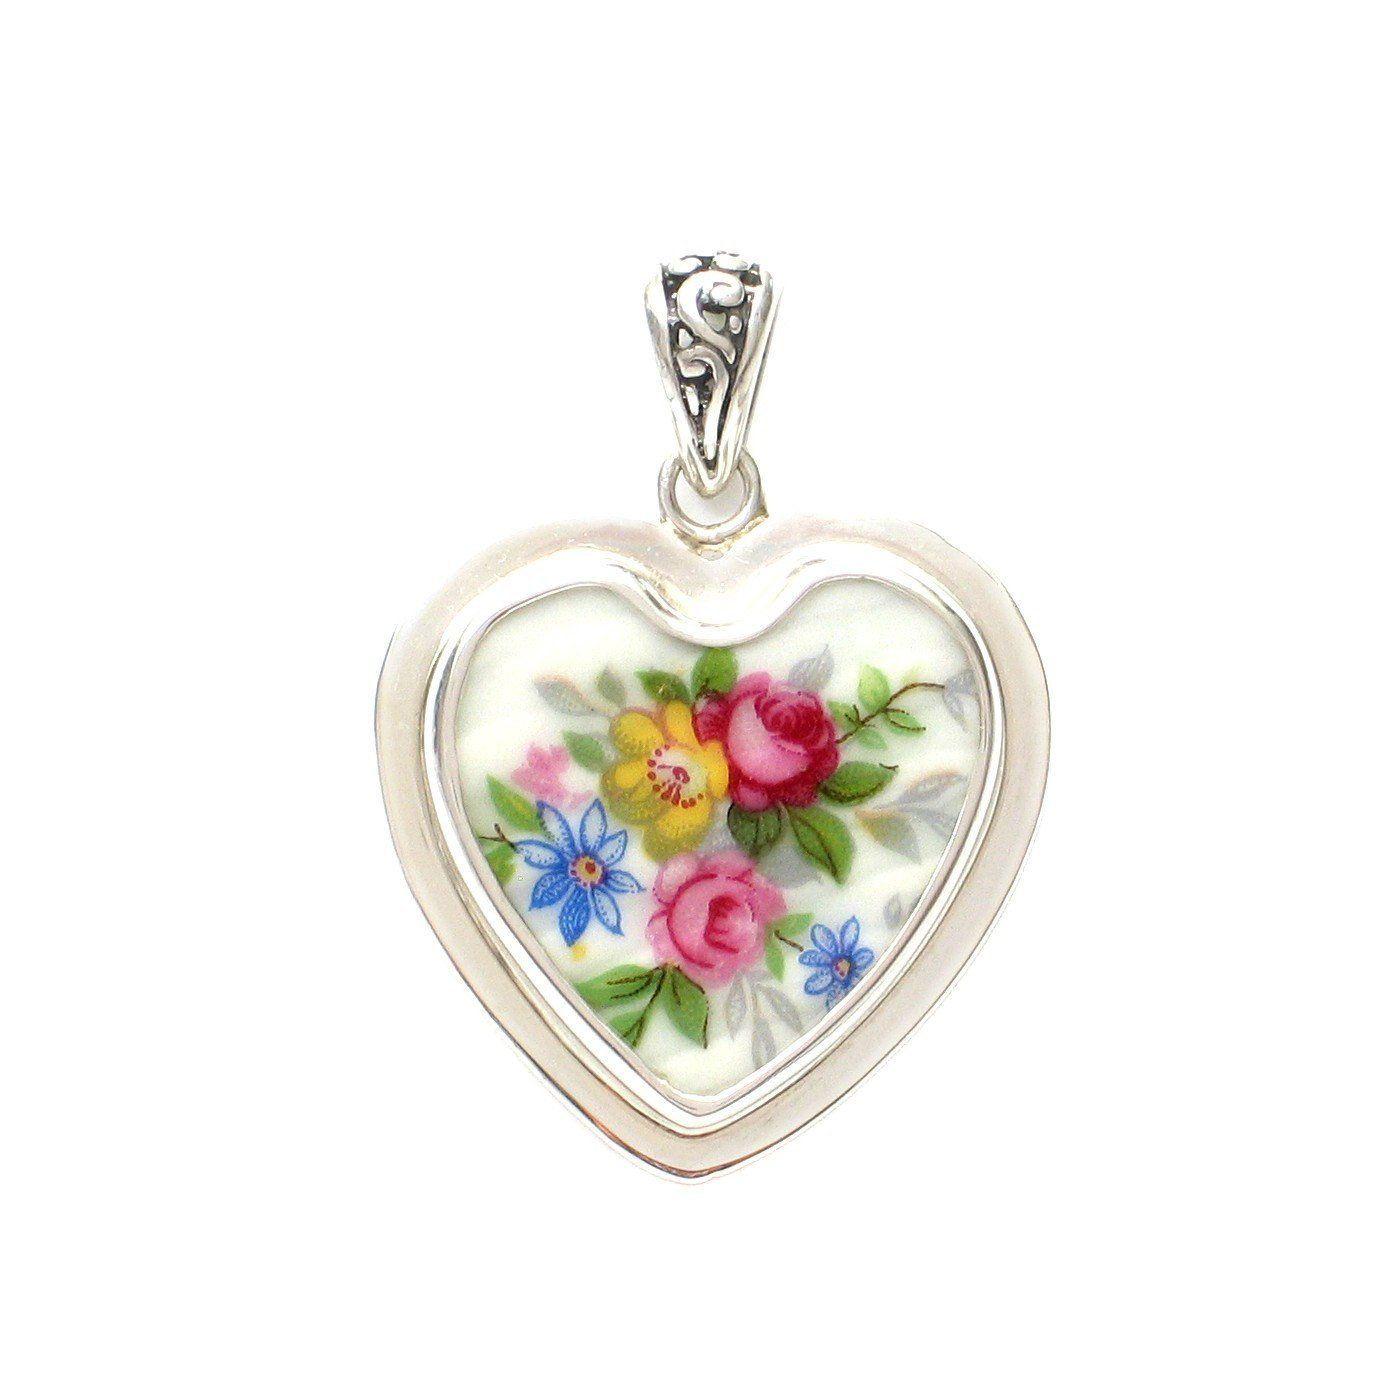 Broken china jewelry vienna rose garden pink yellow blue heart